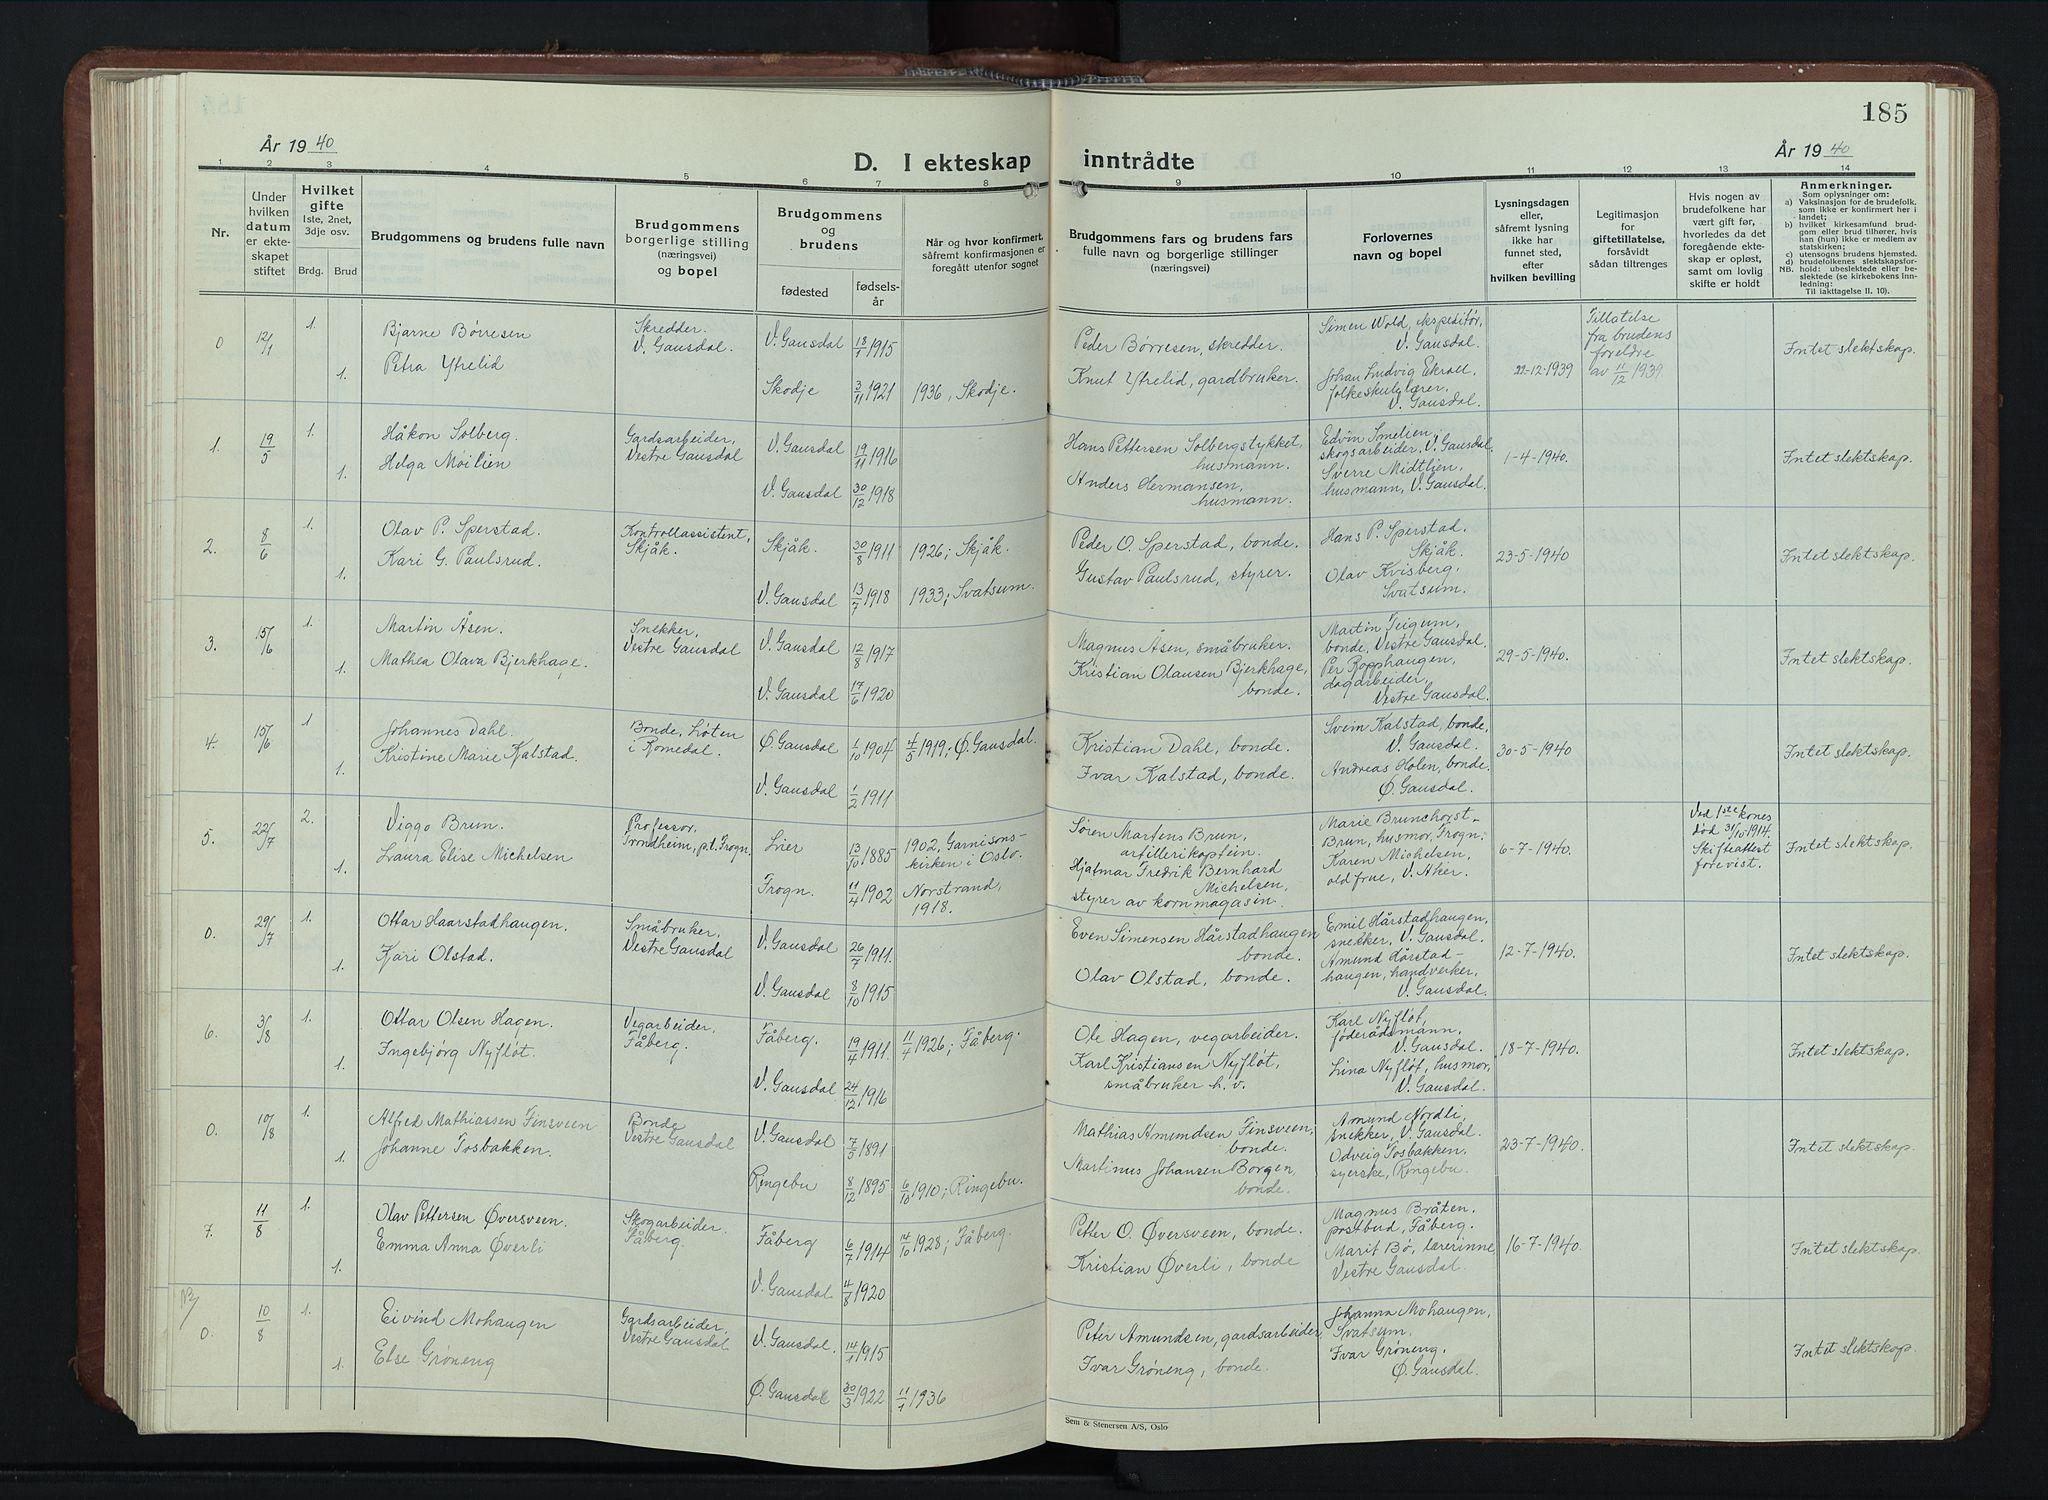 SAH, Vestre Gausdal prestekontor, Klokkerbok nr. 5, 1926-1955, s. 185